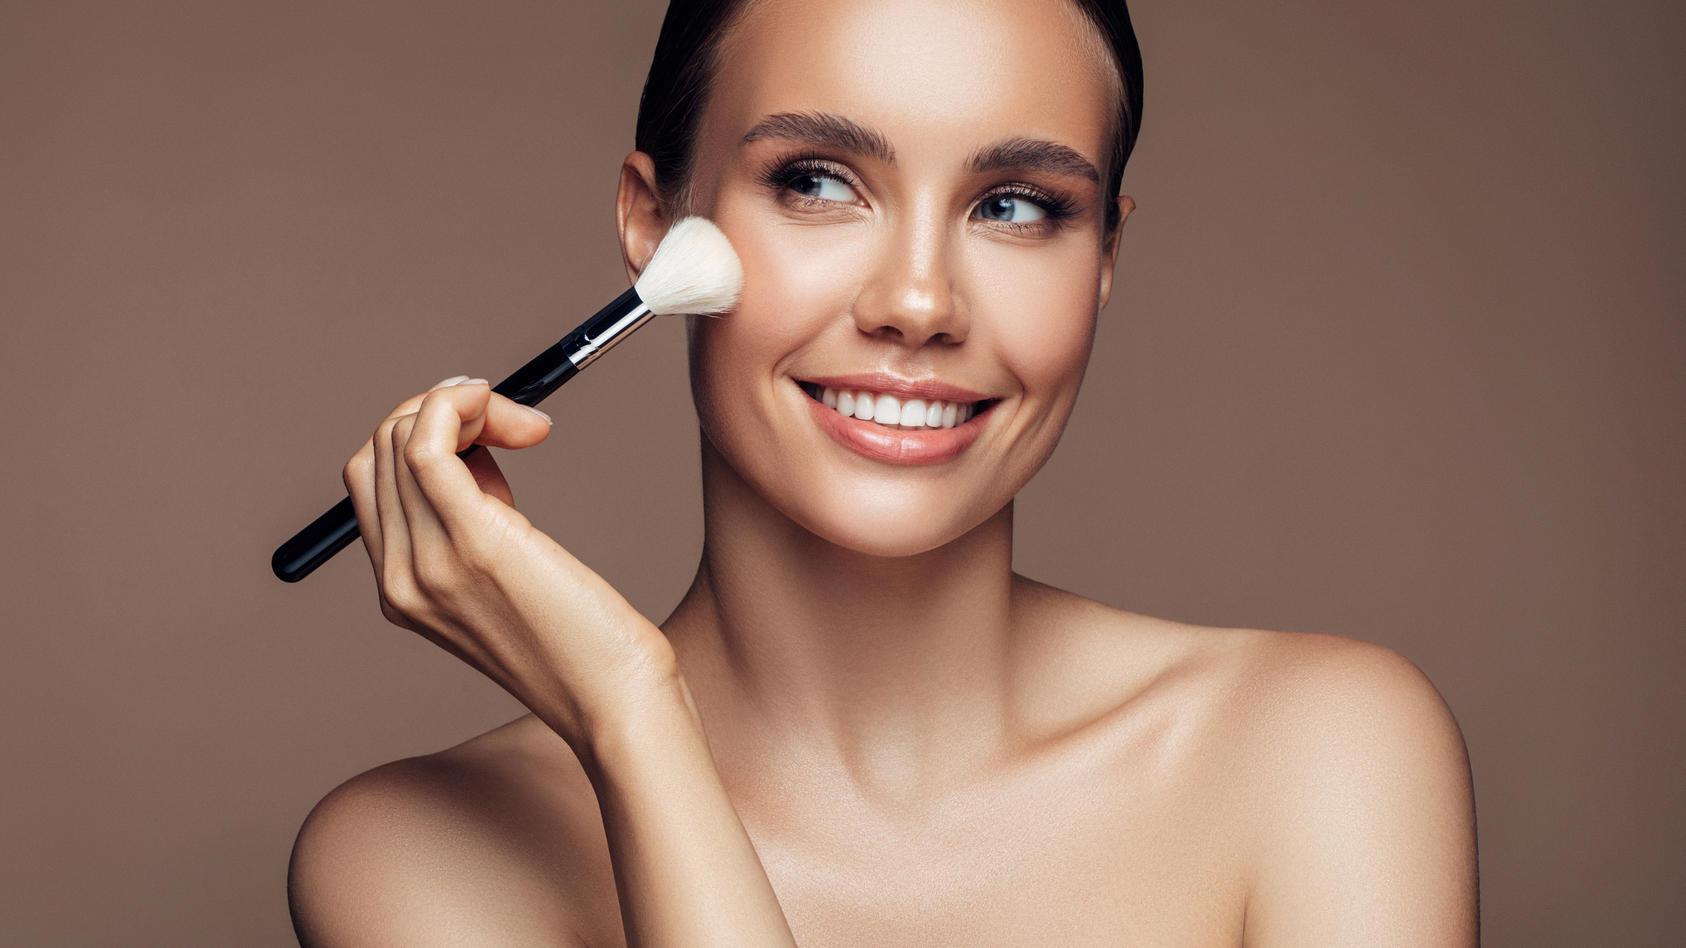 pinpoint-powdering-so-gelingt-das-make-up-garantiert